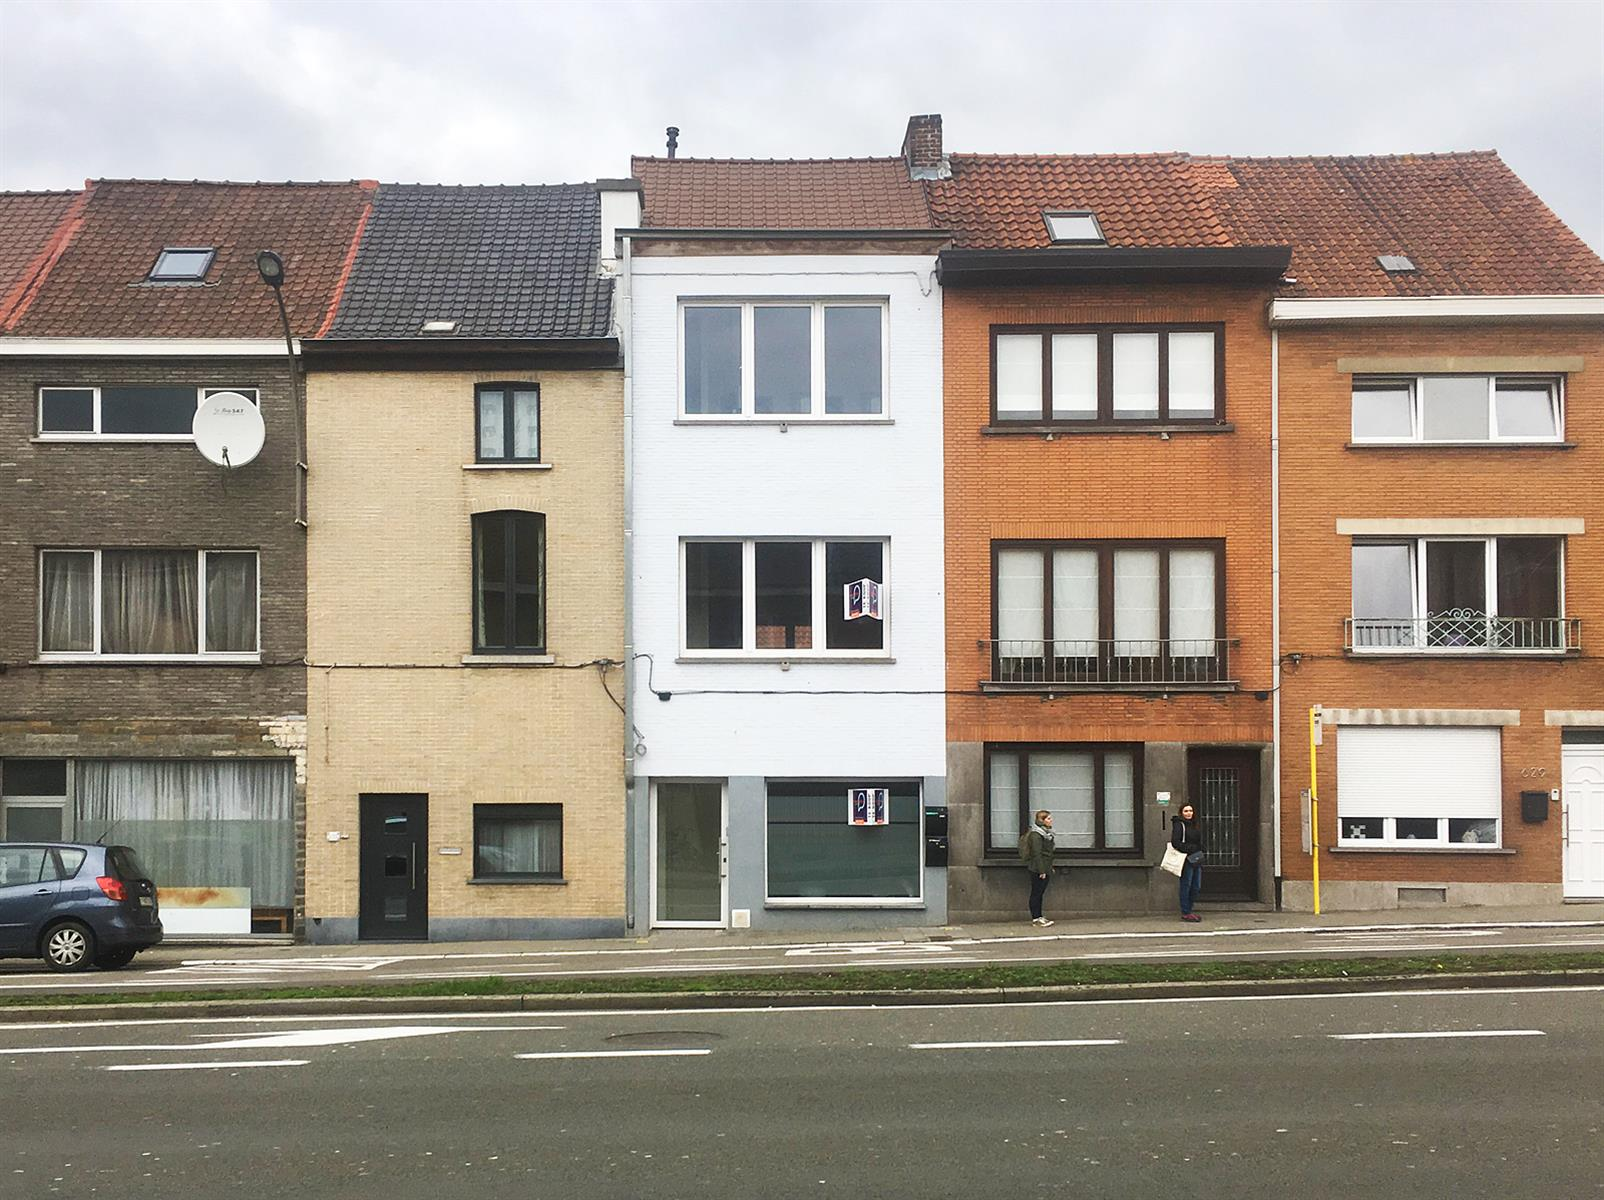 Opbrengsteigendom handelsruimte + 3 SLPK appartement